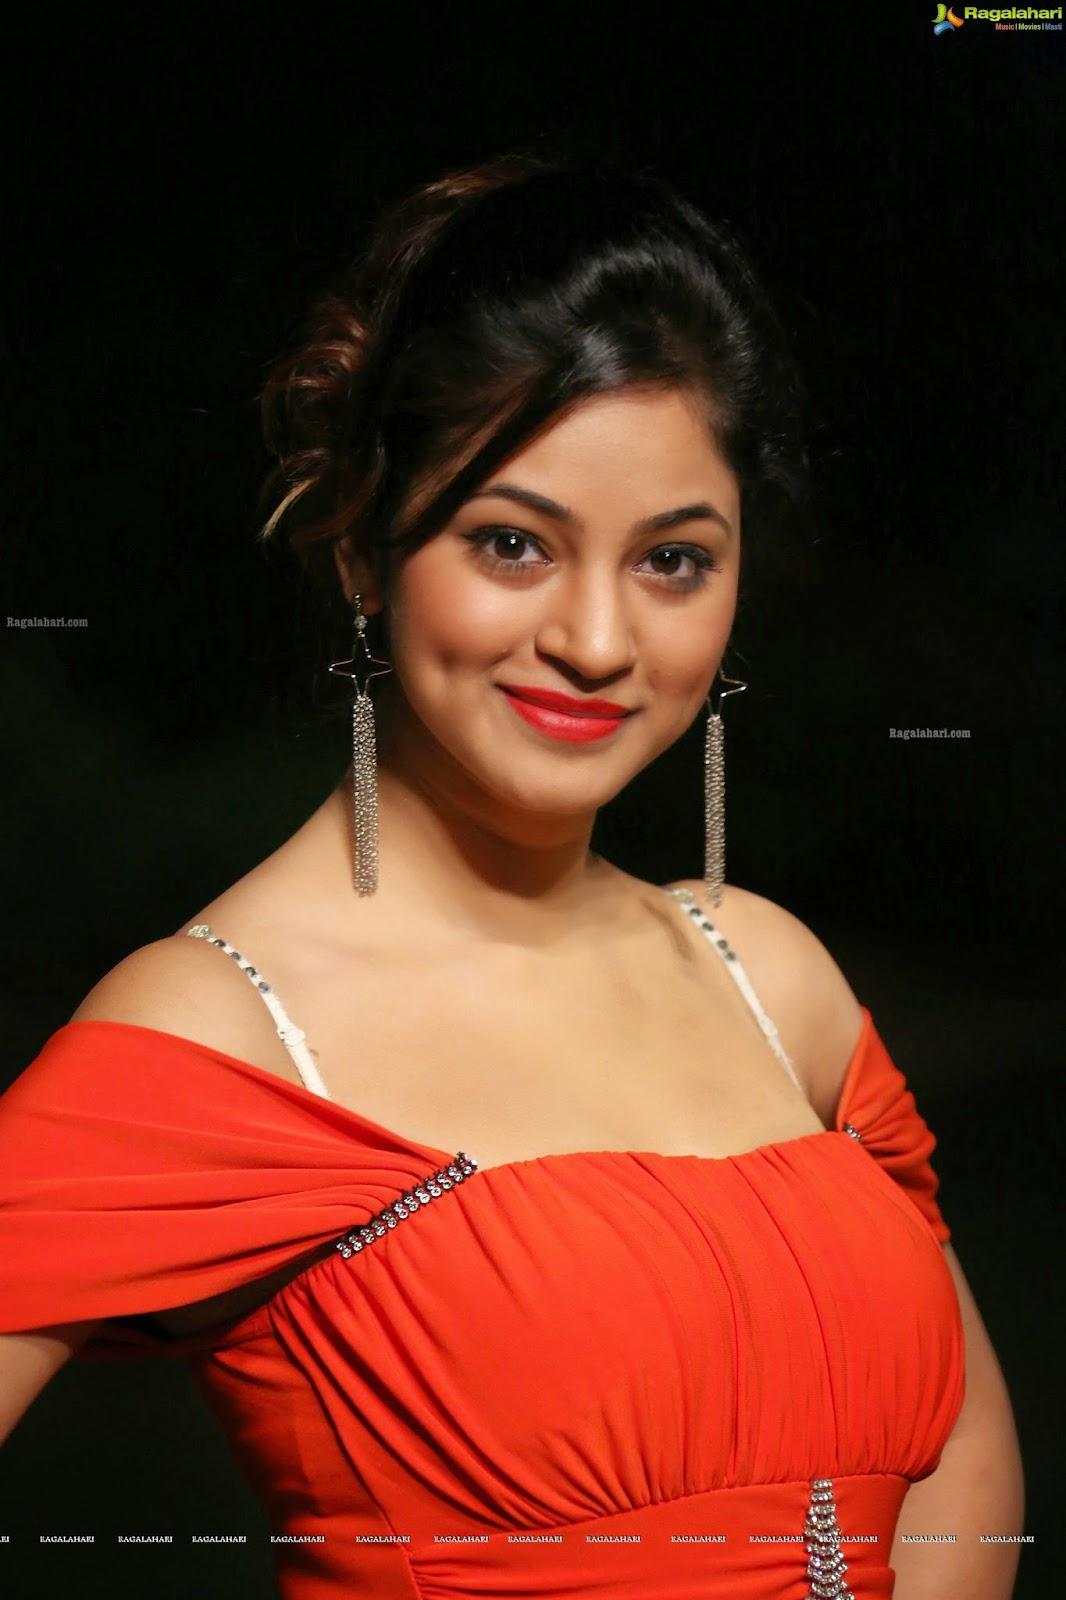 Shilpi Sharma Hot Photos - Photo 1 of 65